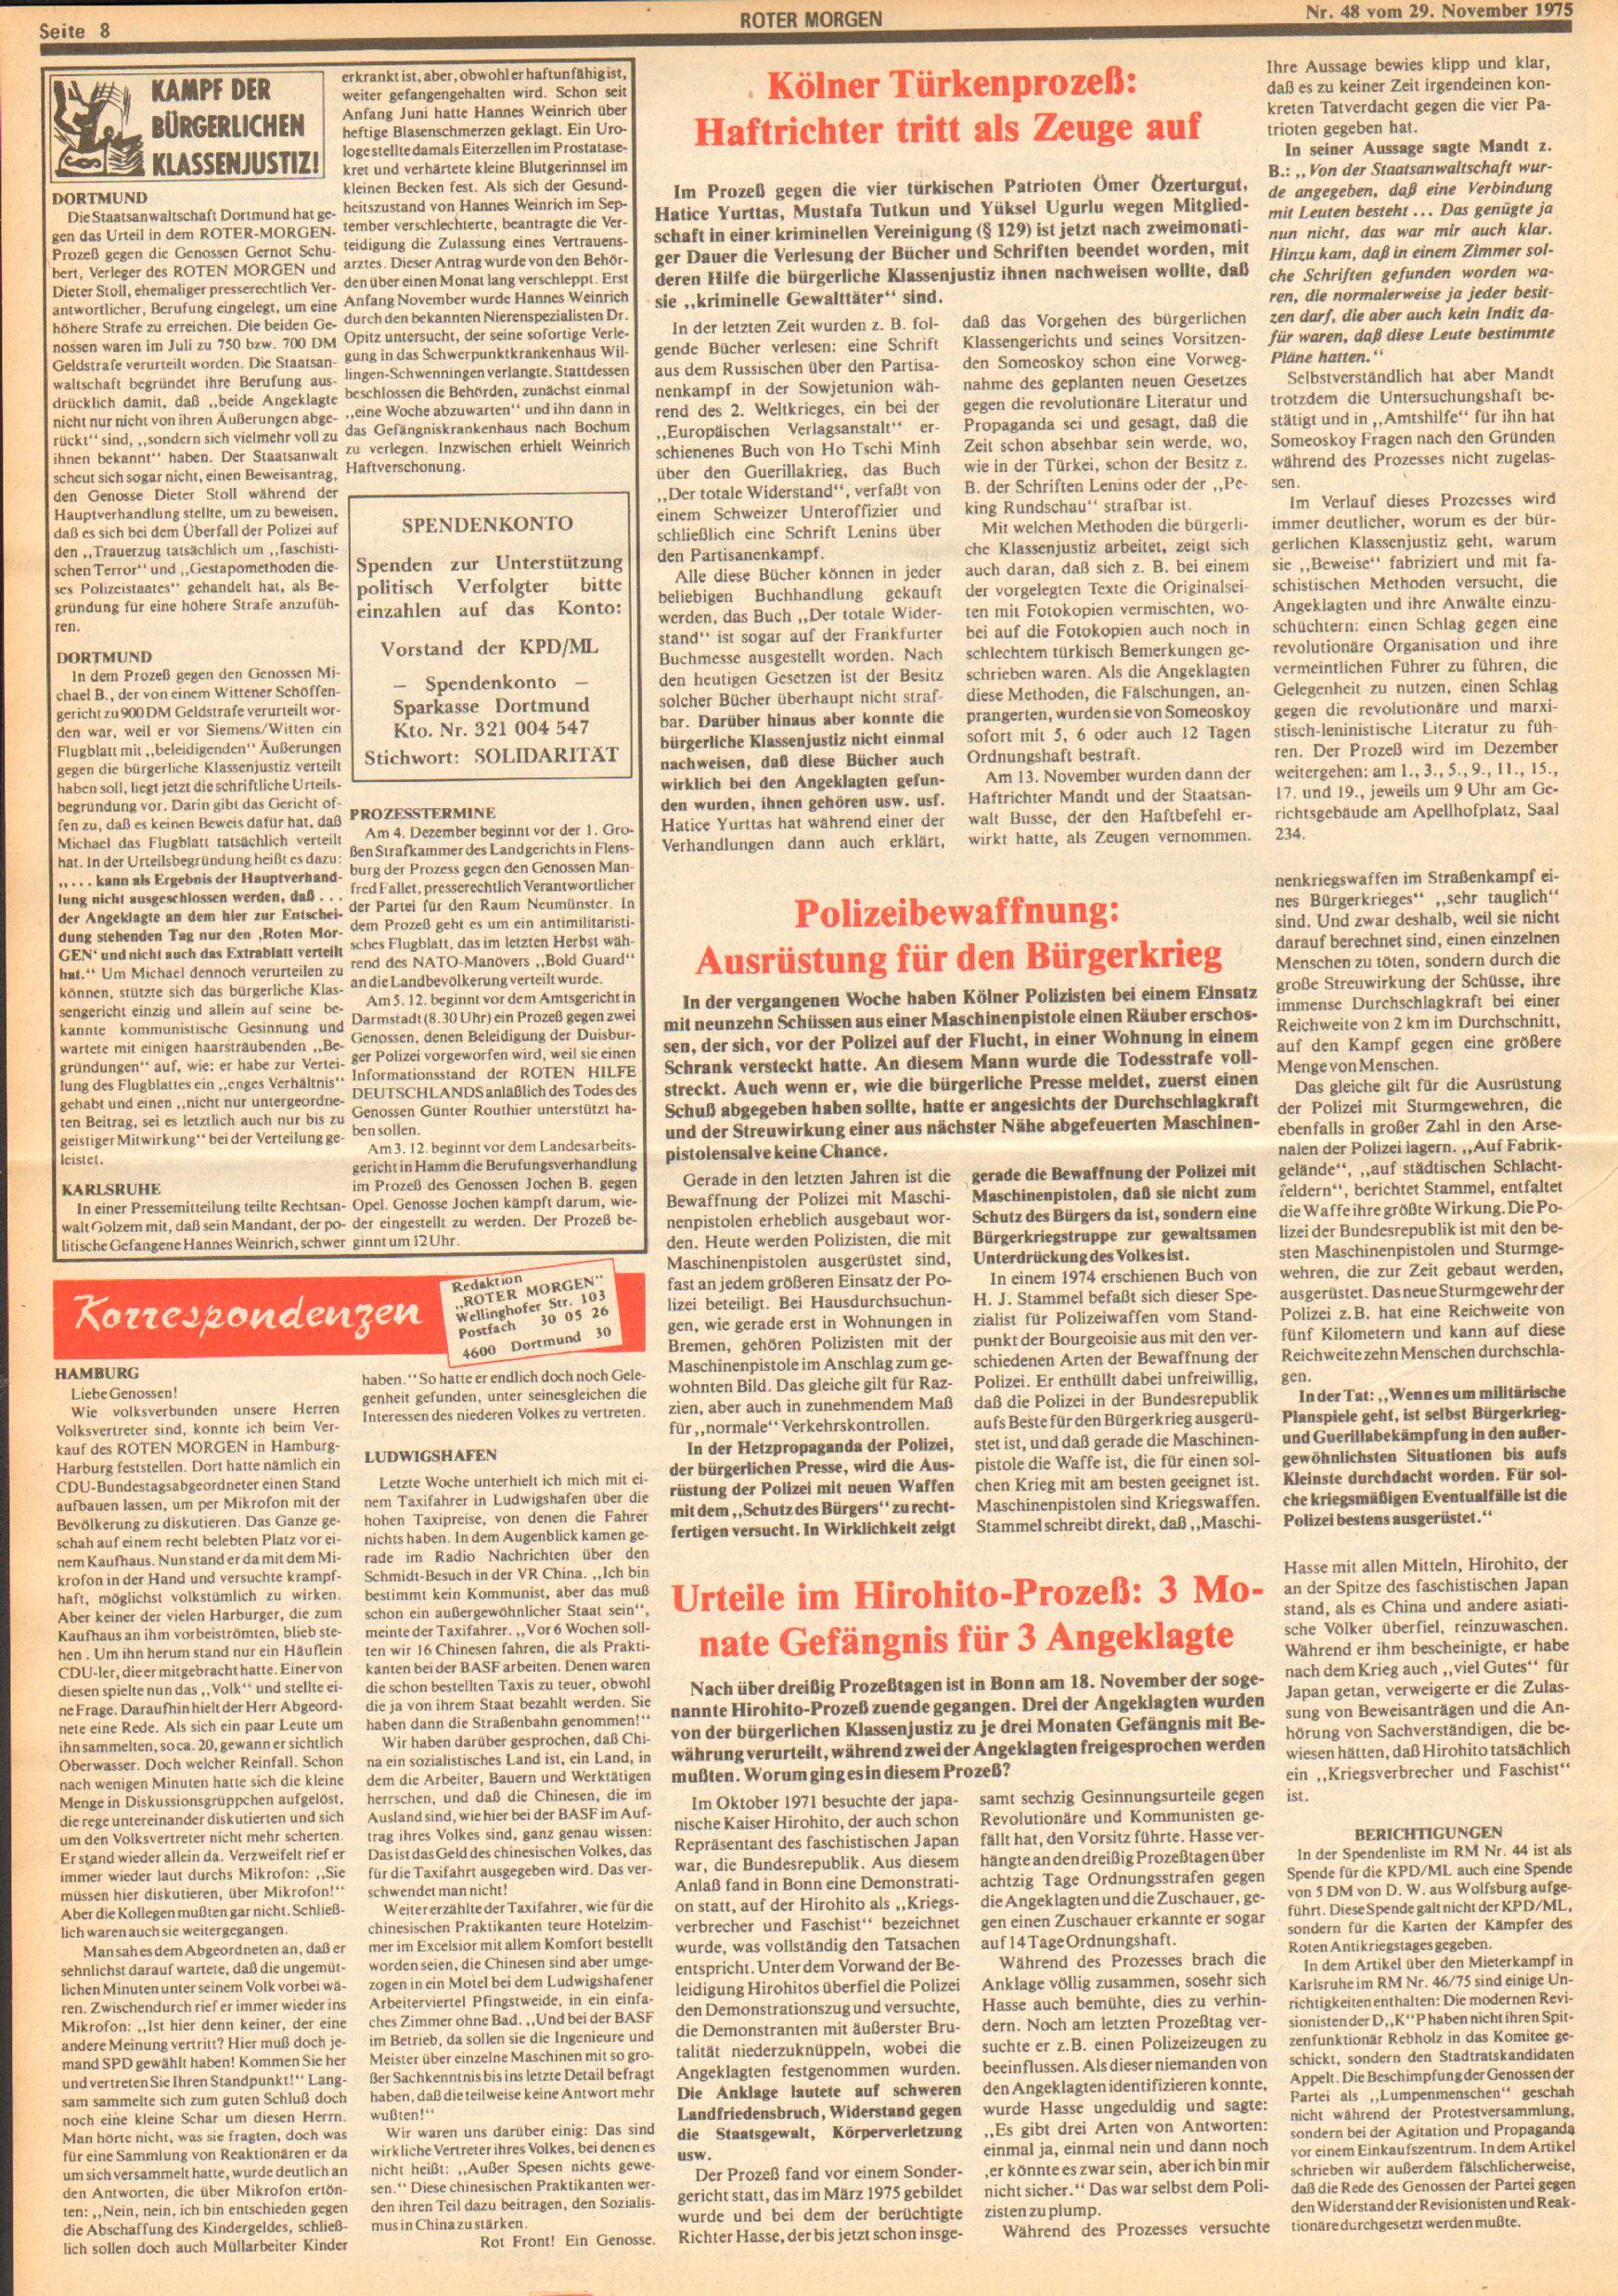 Roter Morgen, 9. Jg., 29. November 1975, Nr. 48, Seite 8